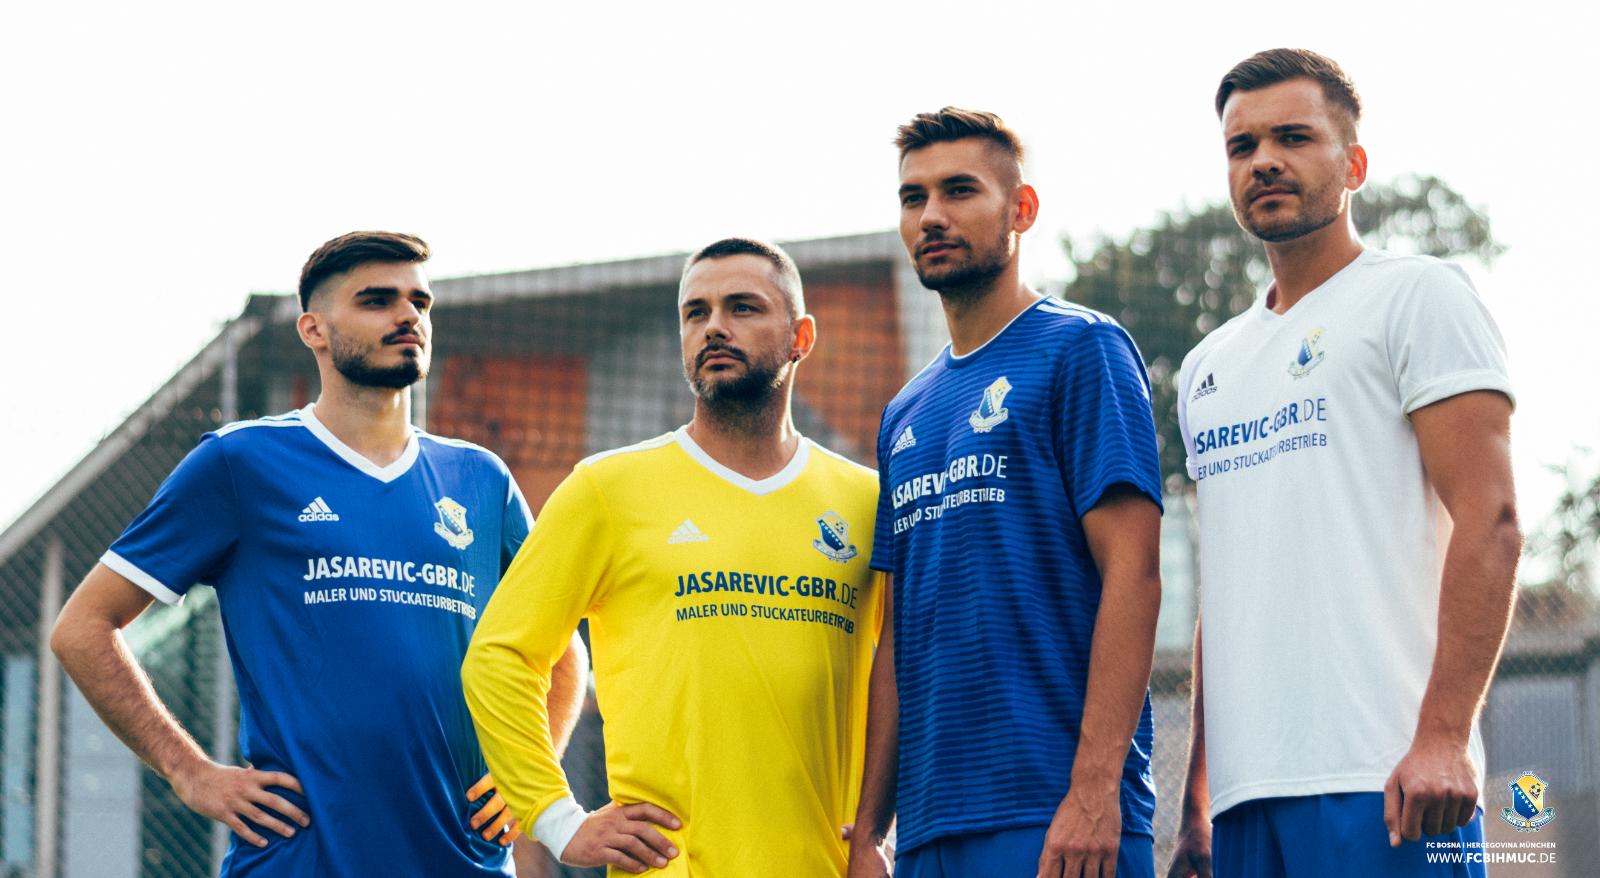 Offizielle Trikots der 1. und 2. Mannschaft - Jasarevic GbR - adidas